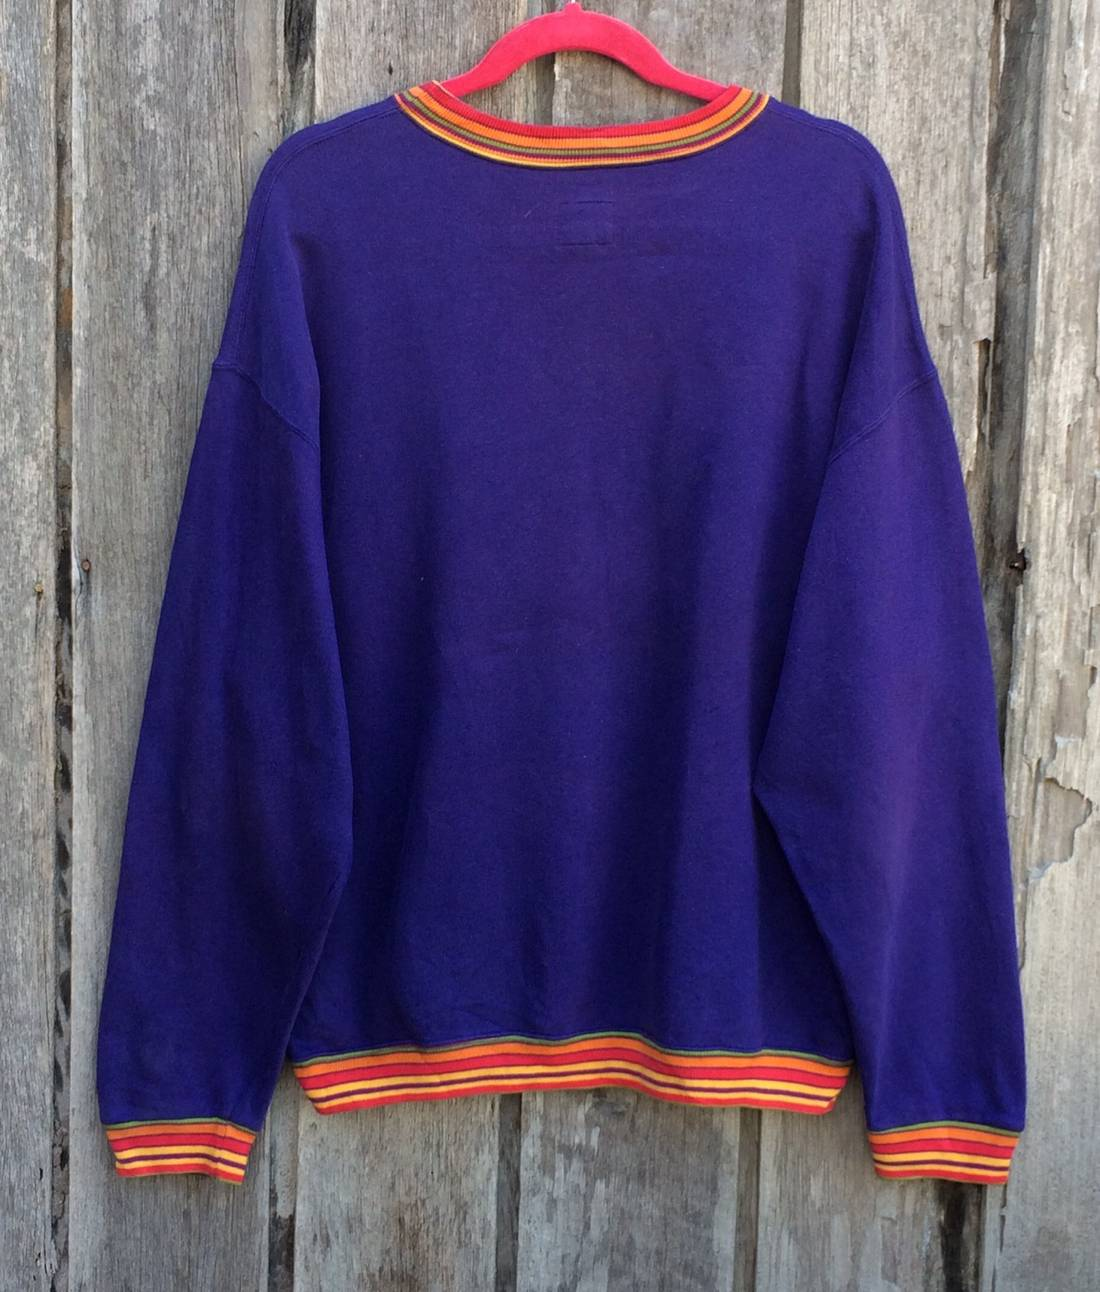 Sale!! Sale!! Vintage United Colour Of Benetton Sweatshirt Spell Out Rare